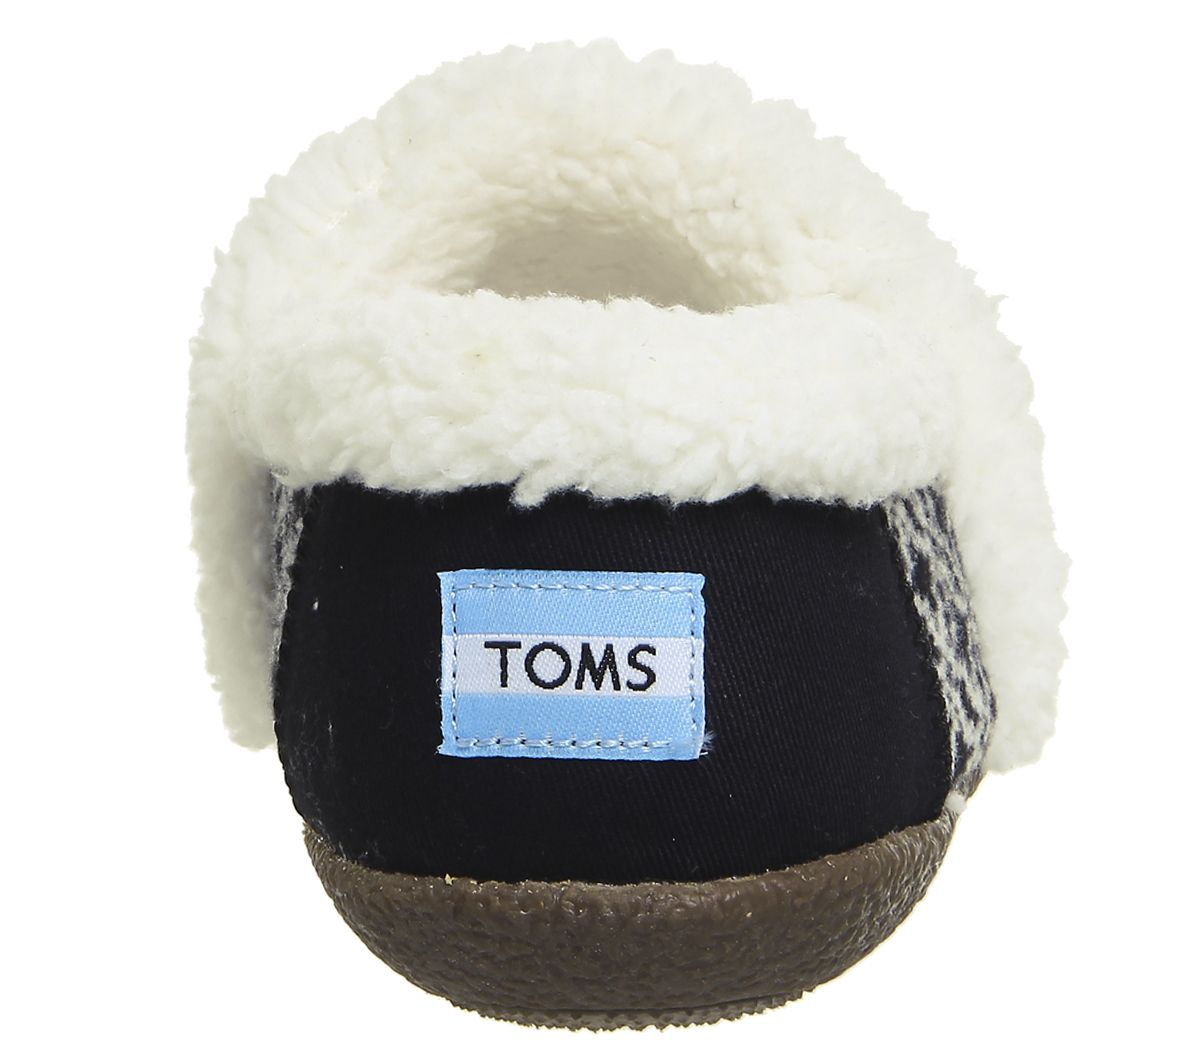 feb307f50bf Toms Toms Slippers Blackwhite Fair Isle - Flats